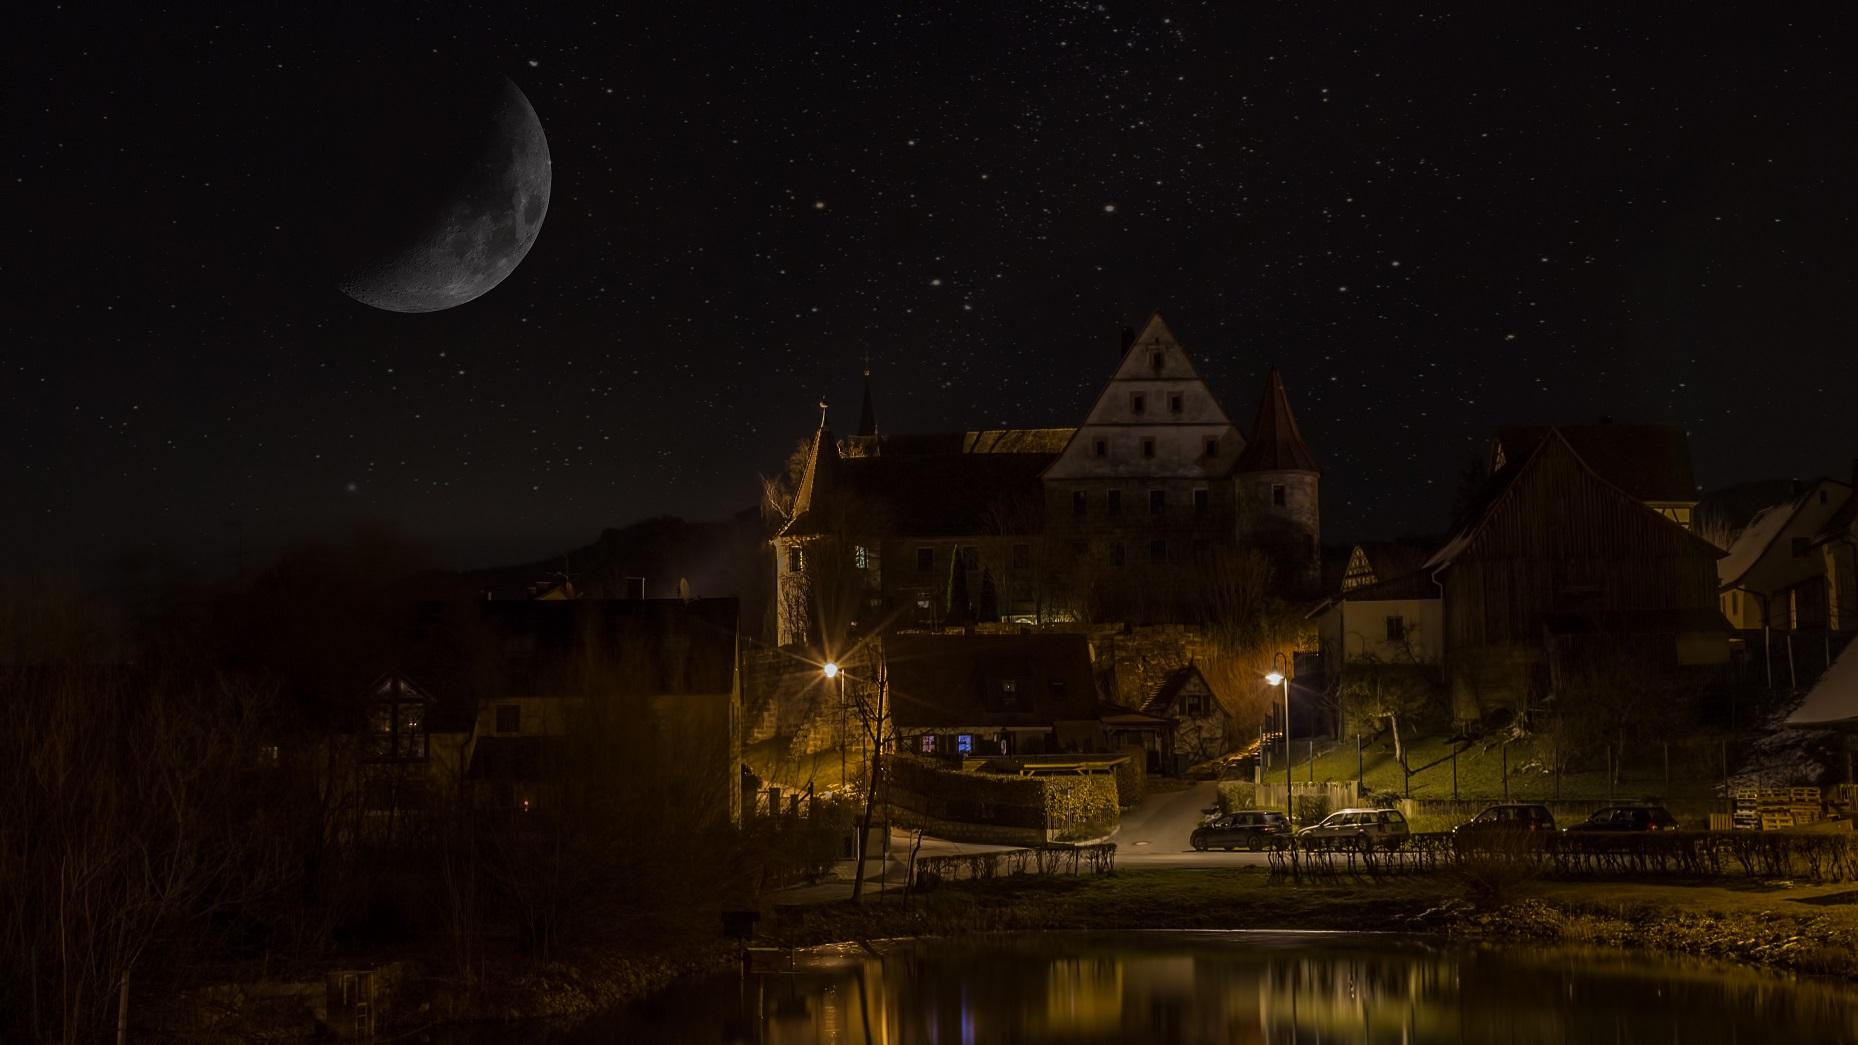 Wiesenthau bei Nacht